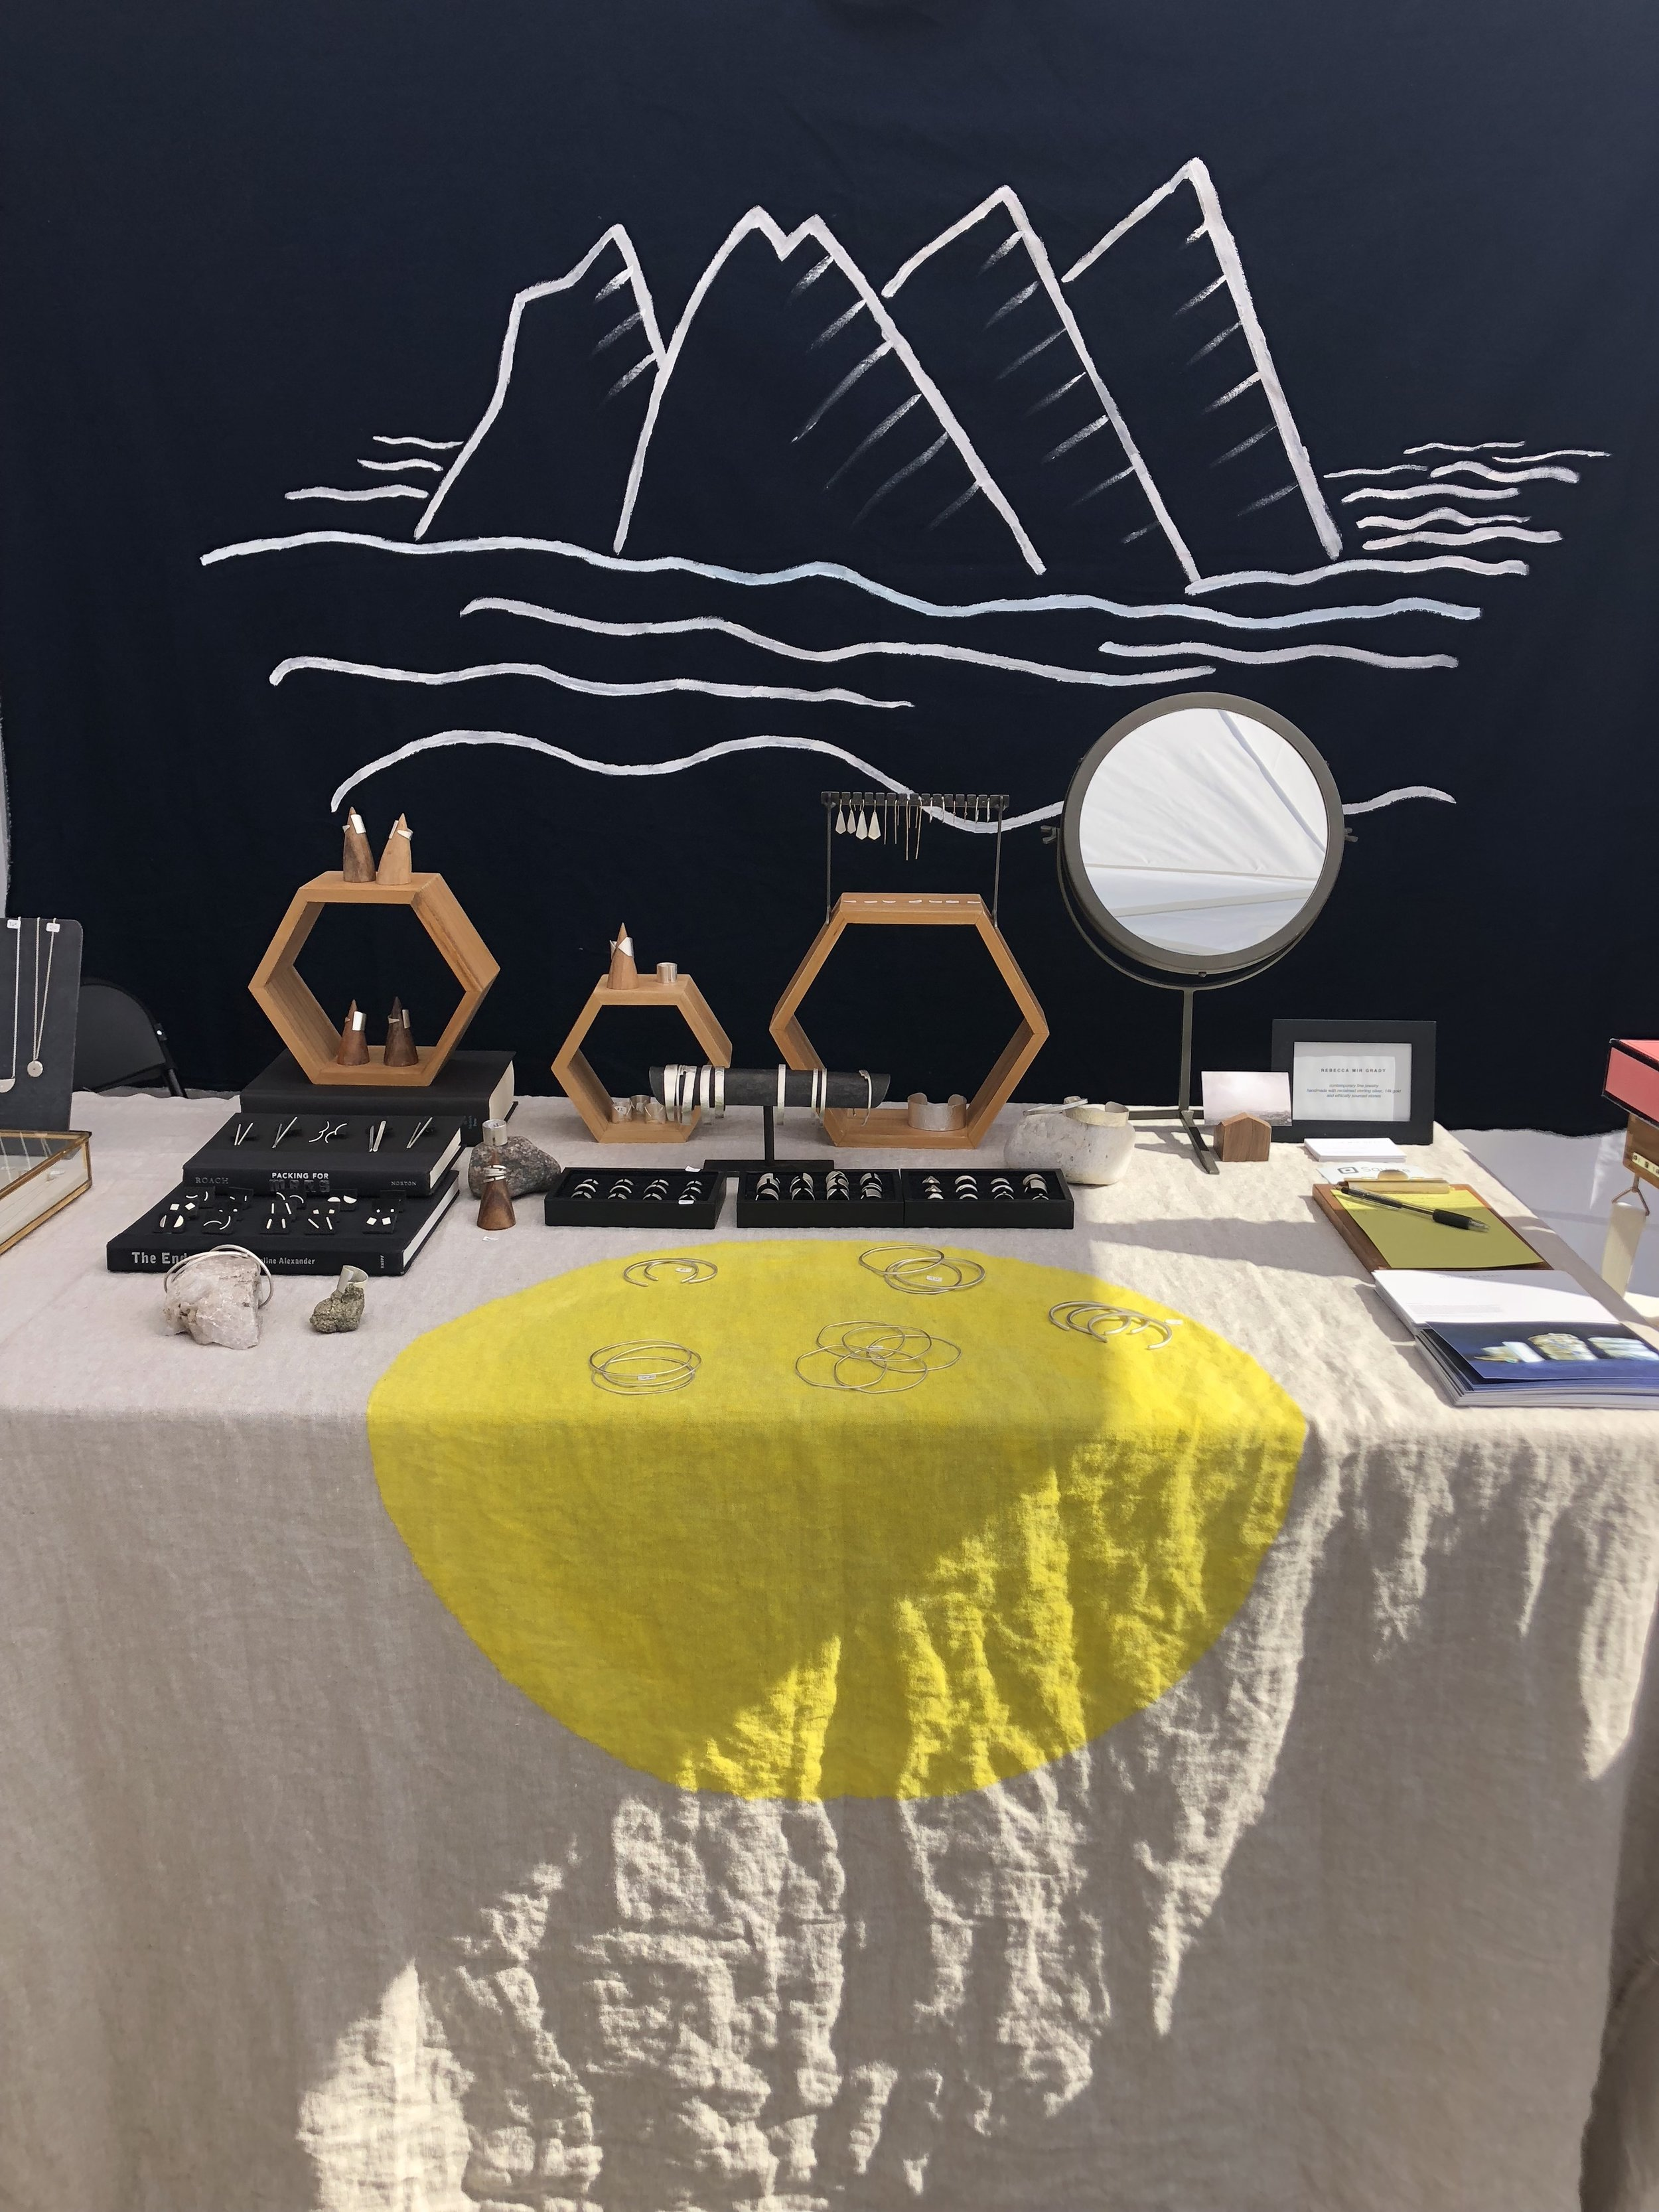 booth set up at renegade craft denver